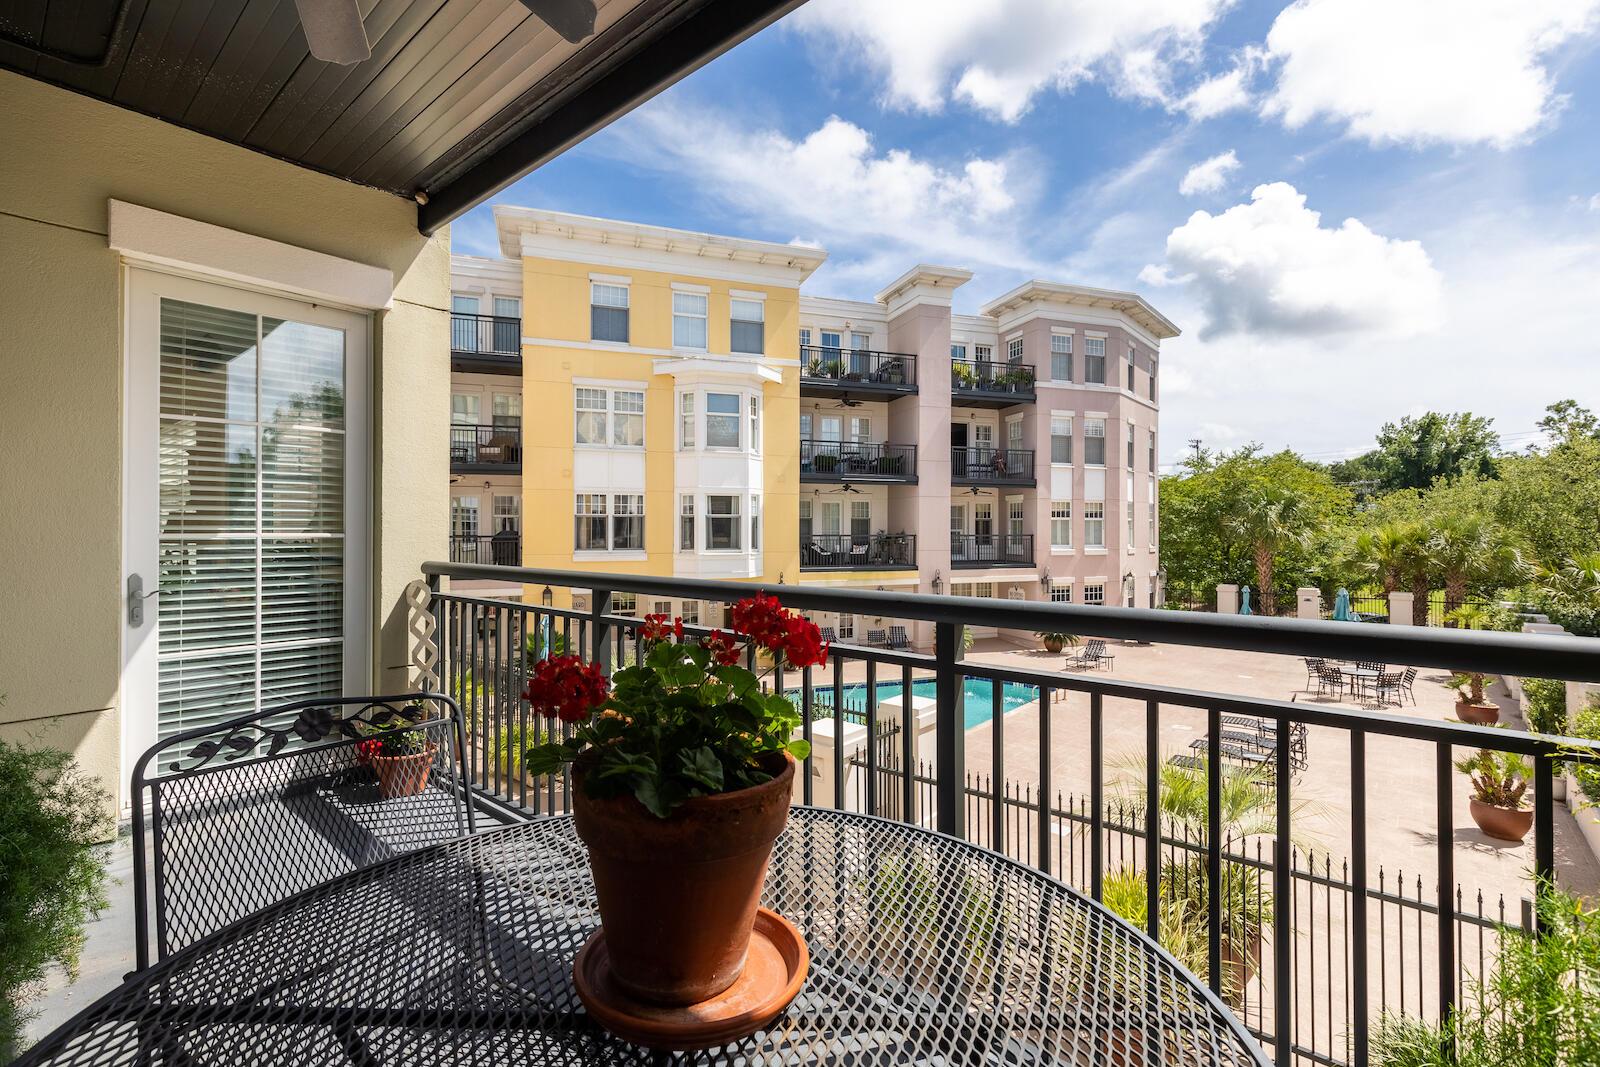 Albemarle Homes For Sale - 498 Albemarle, Charleston, SC - 6